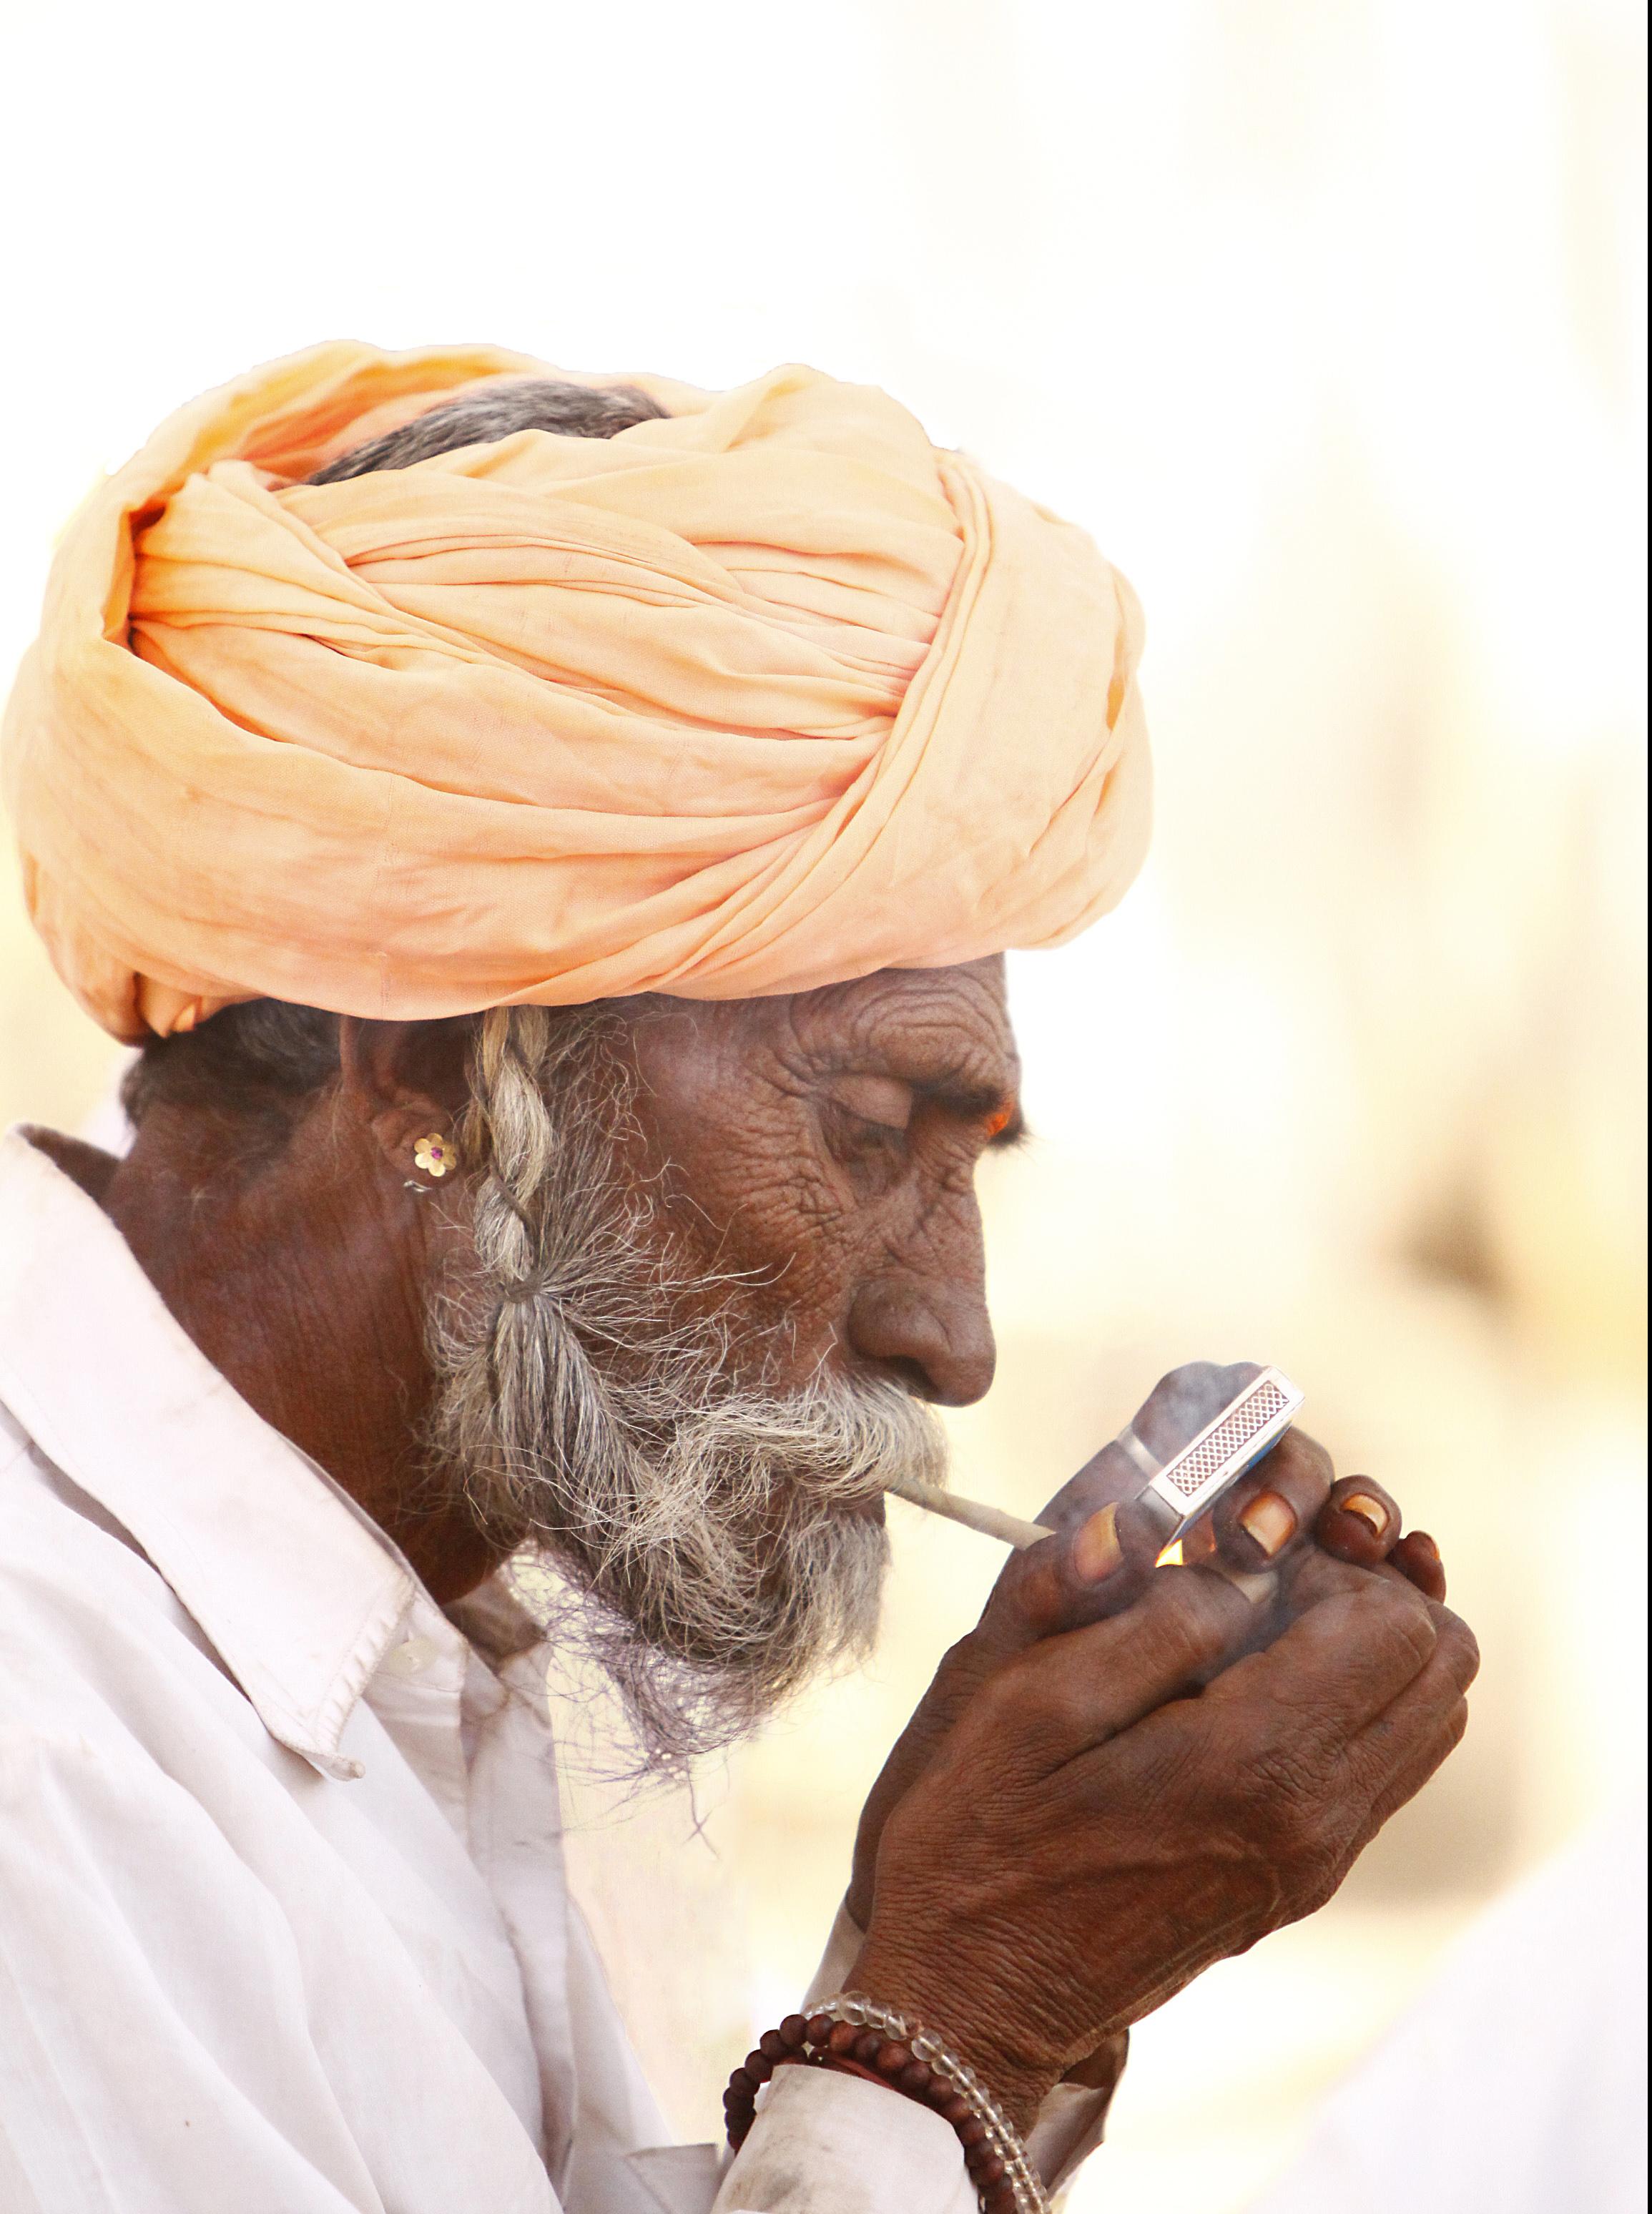 portraits-indien-inde-rajasthan-2010-marie-colette-becker-09